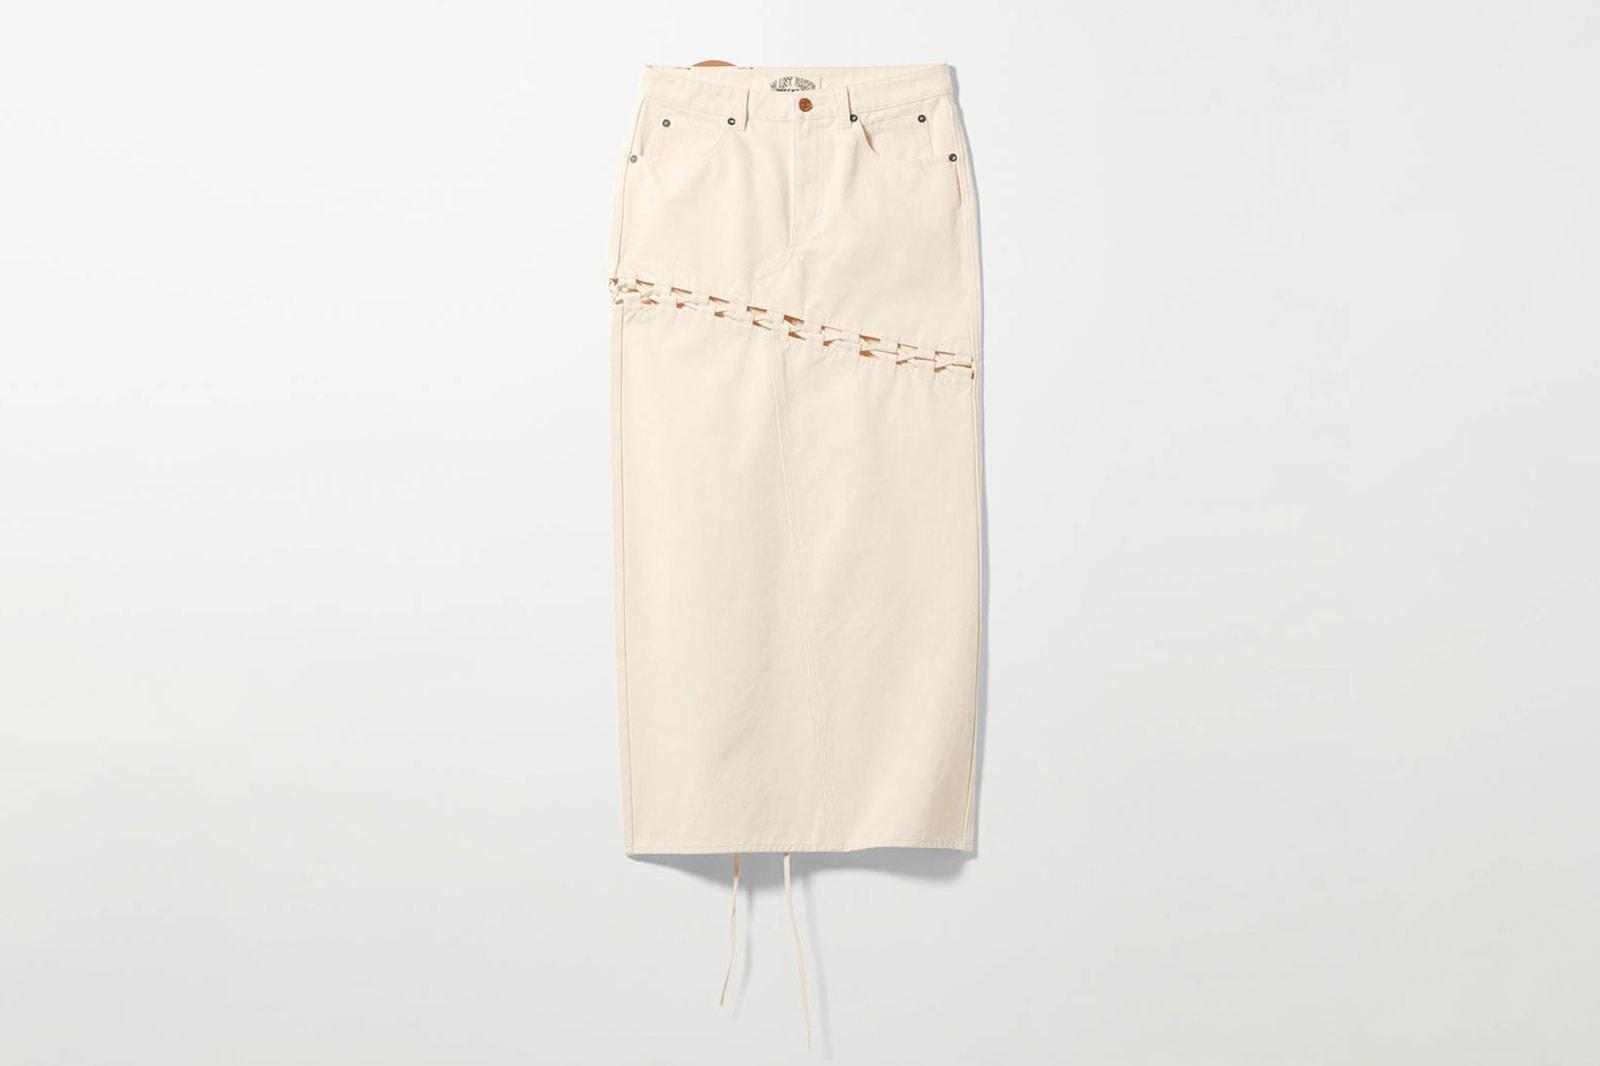 weekday denim jeans hemp plant based sustainable jackets skirts pants